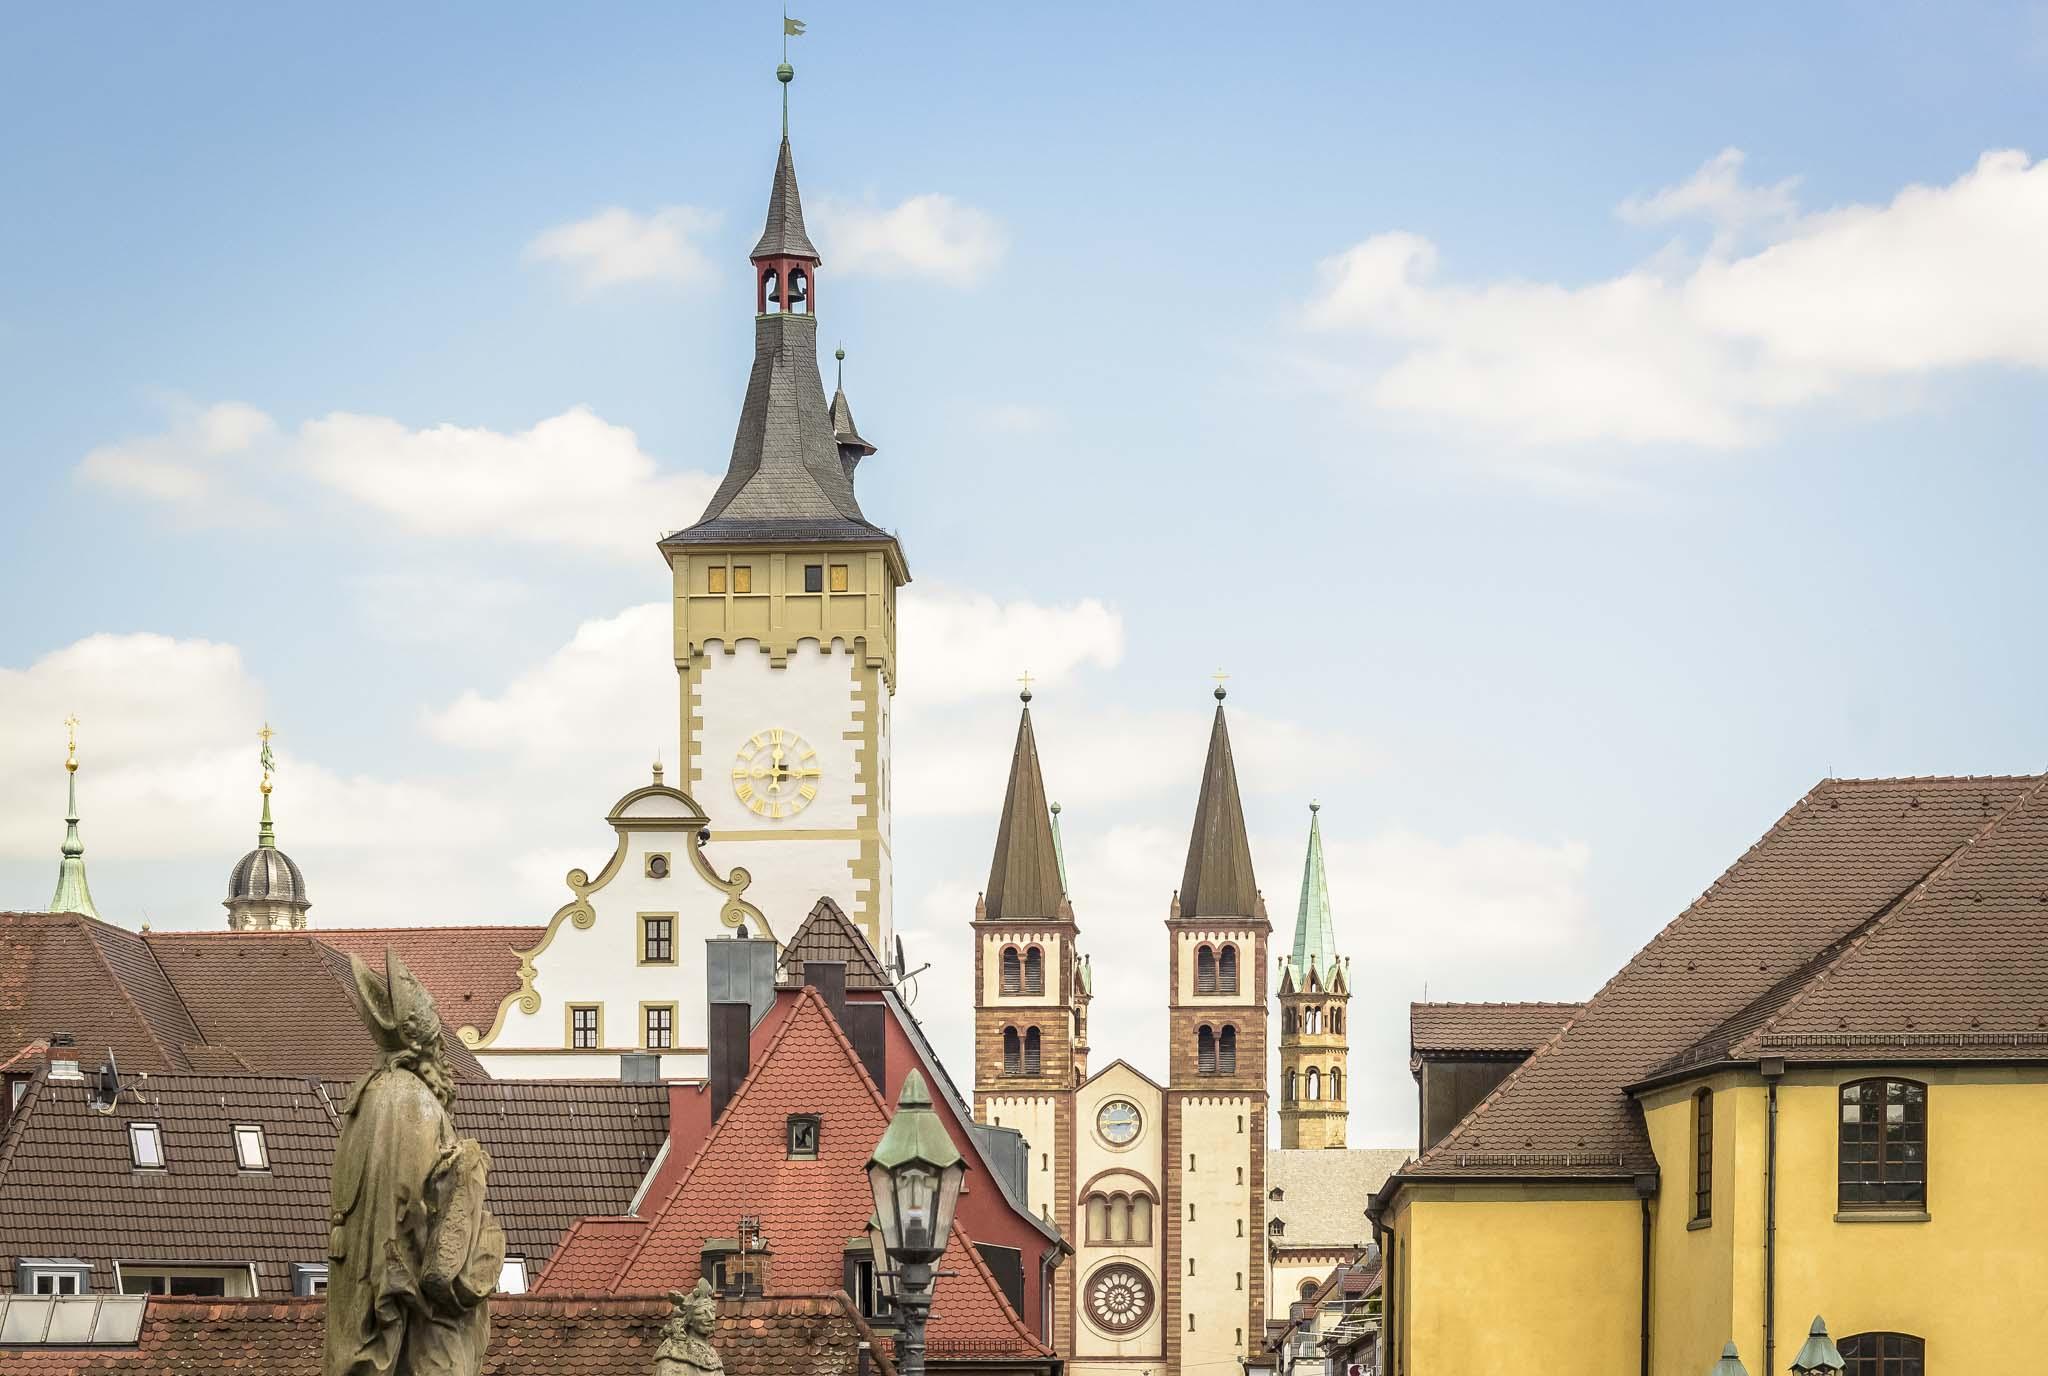 Das August Motiv des Würzburg Kalenders. Foto: Pascal Höfig